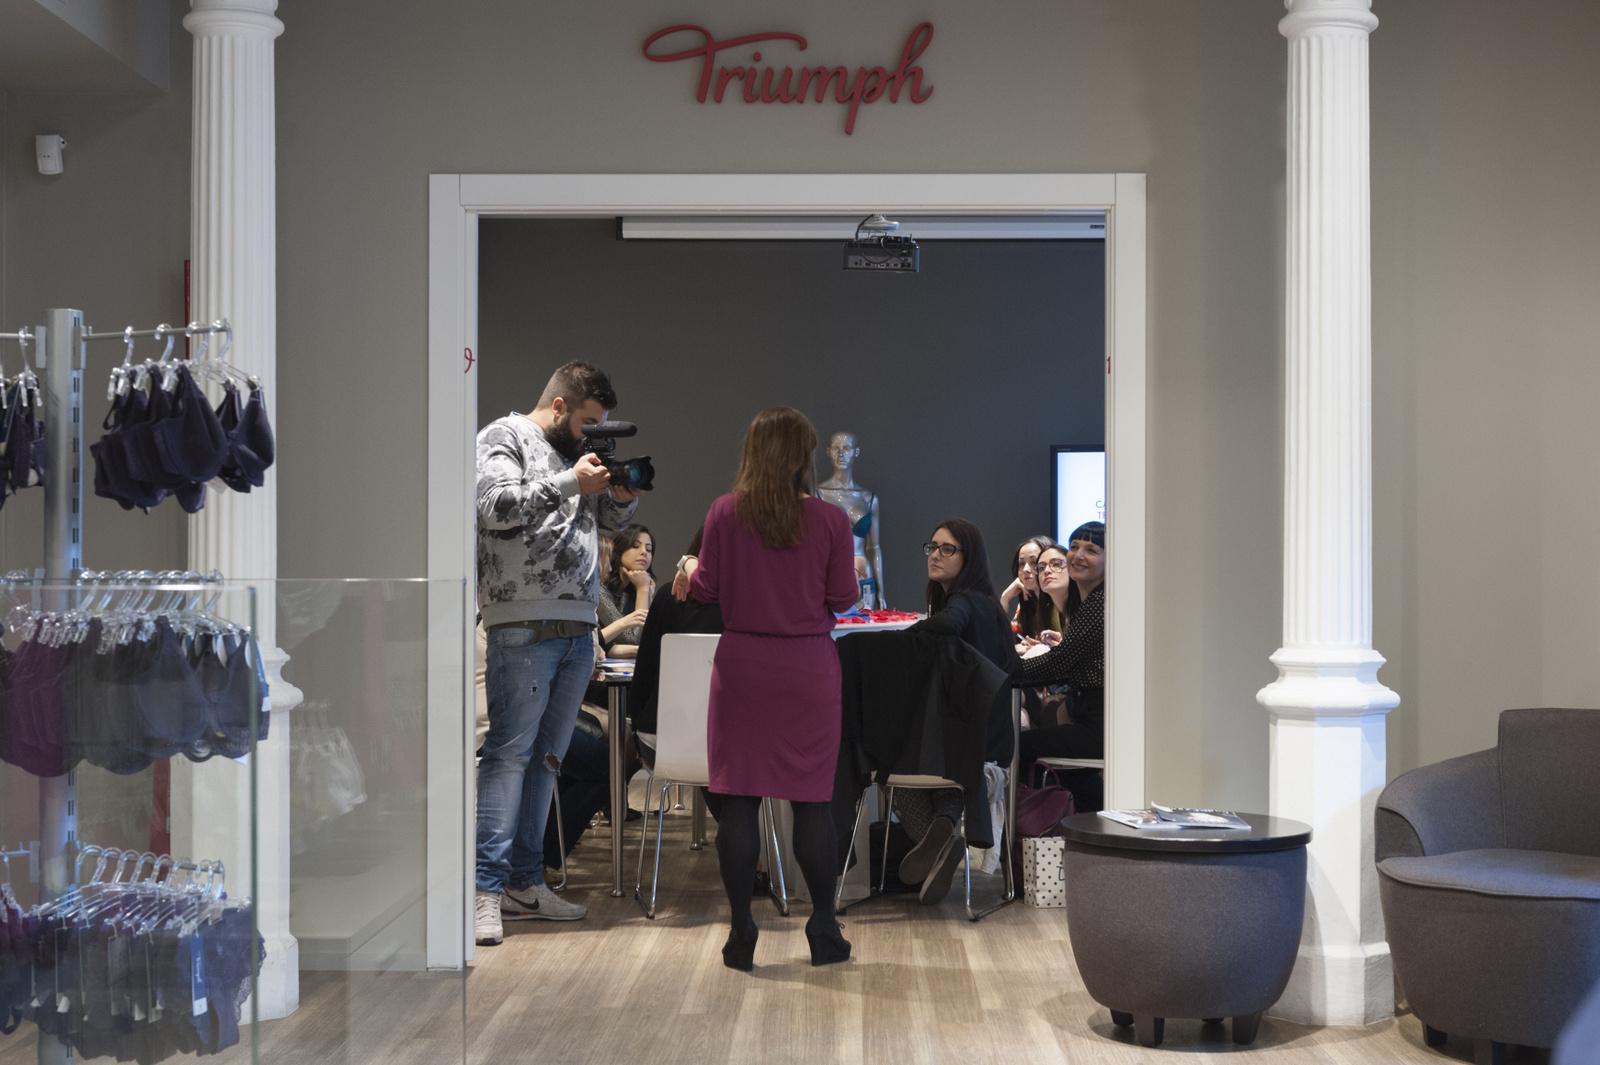 Magic Wire, Magic Wire Experience, Life Coaching , Triumph, Triumph Lingerie studio